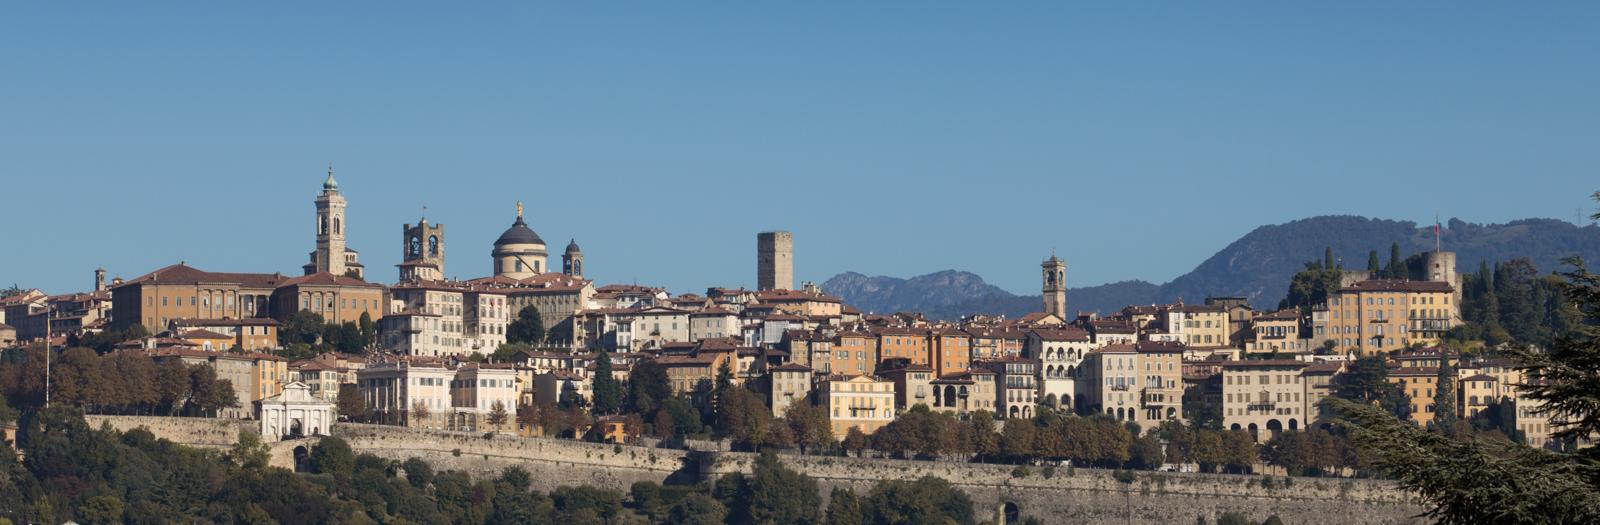 Veduta panoramica di Bergamo Alta